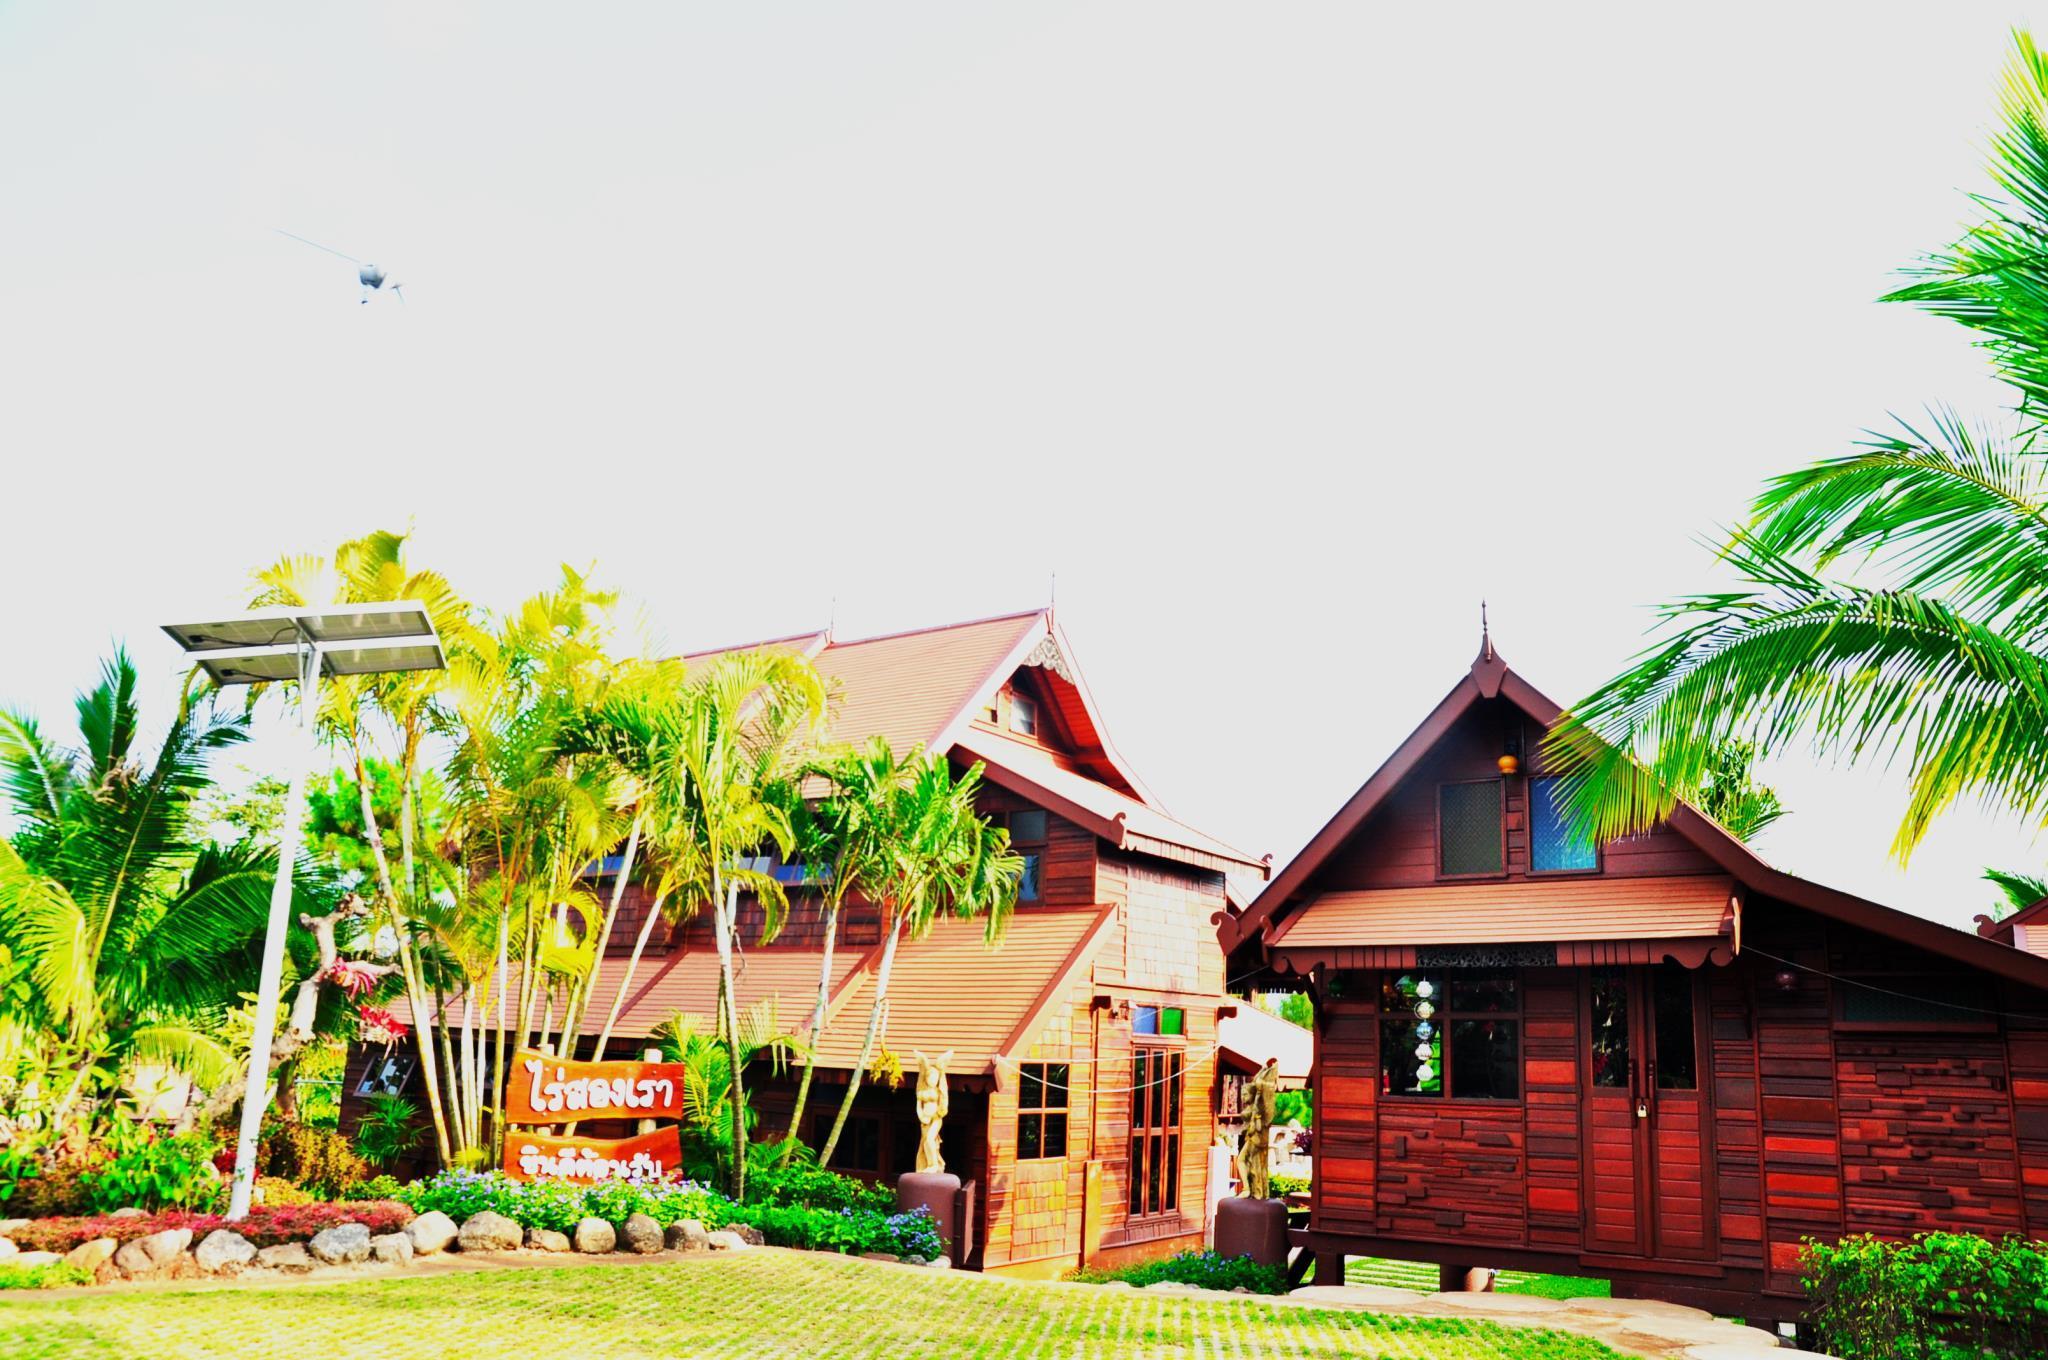 Raisongrao Resort Khao Kho,ไร่สองเรา รีสอร์ต เขาค้อ